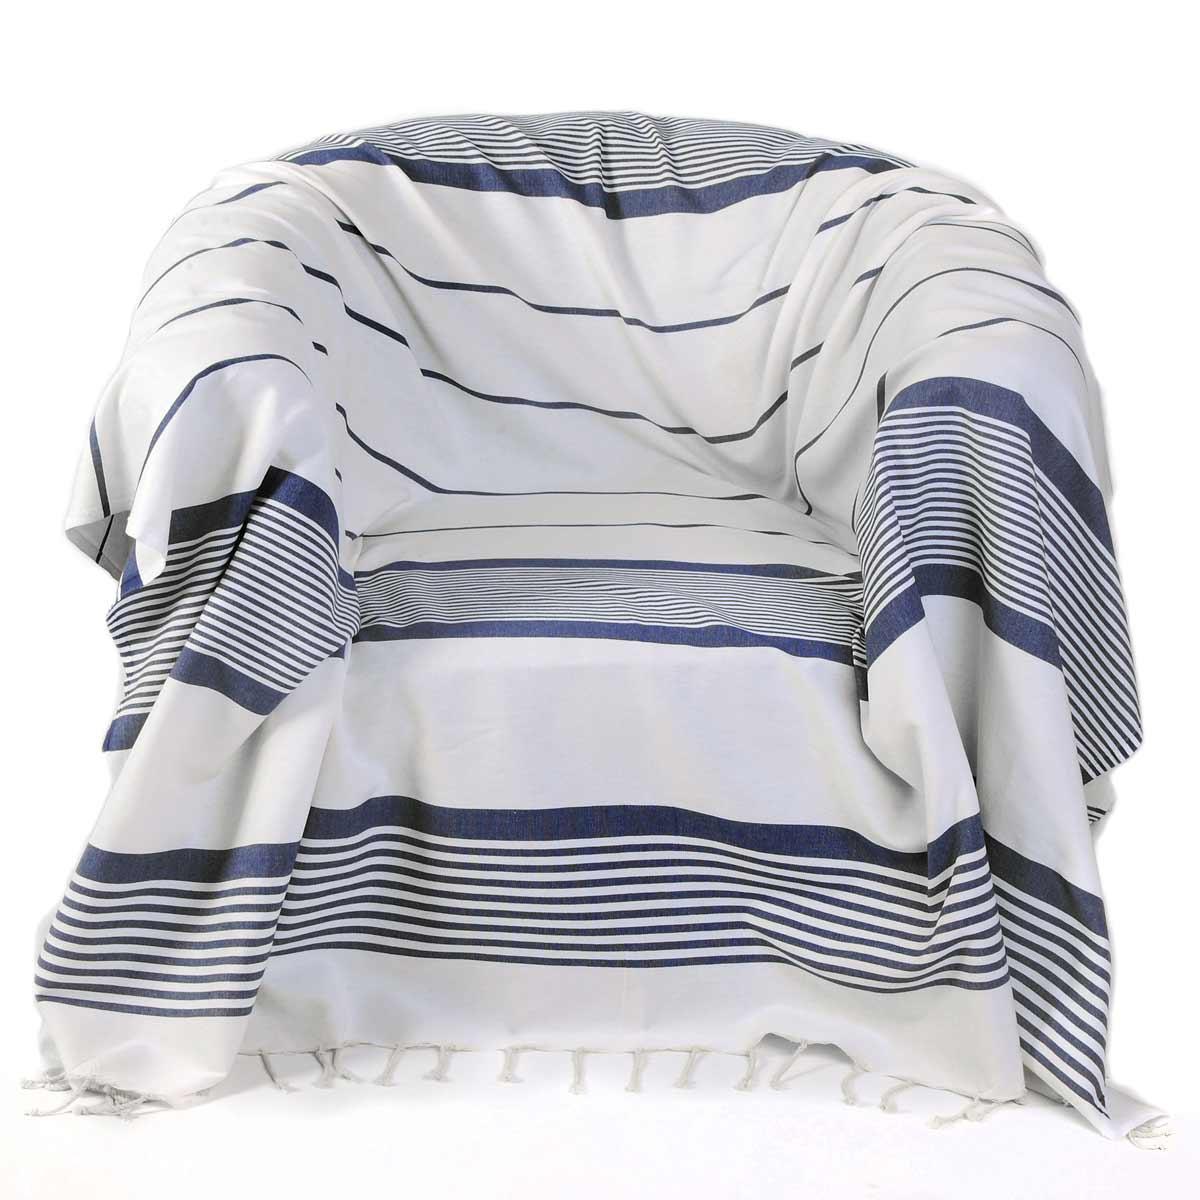 CASABLANCA - Jeté fauteuil coton fond blanc rayures bleu roi 200 x 200